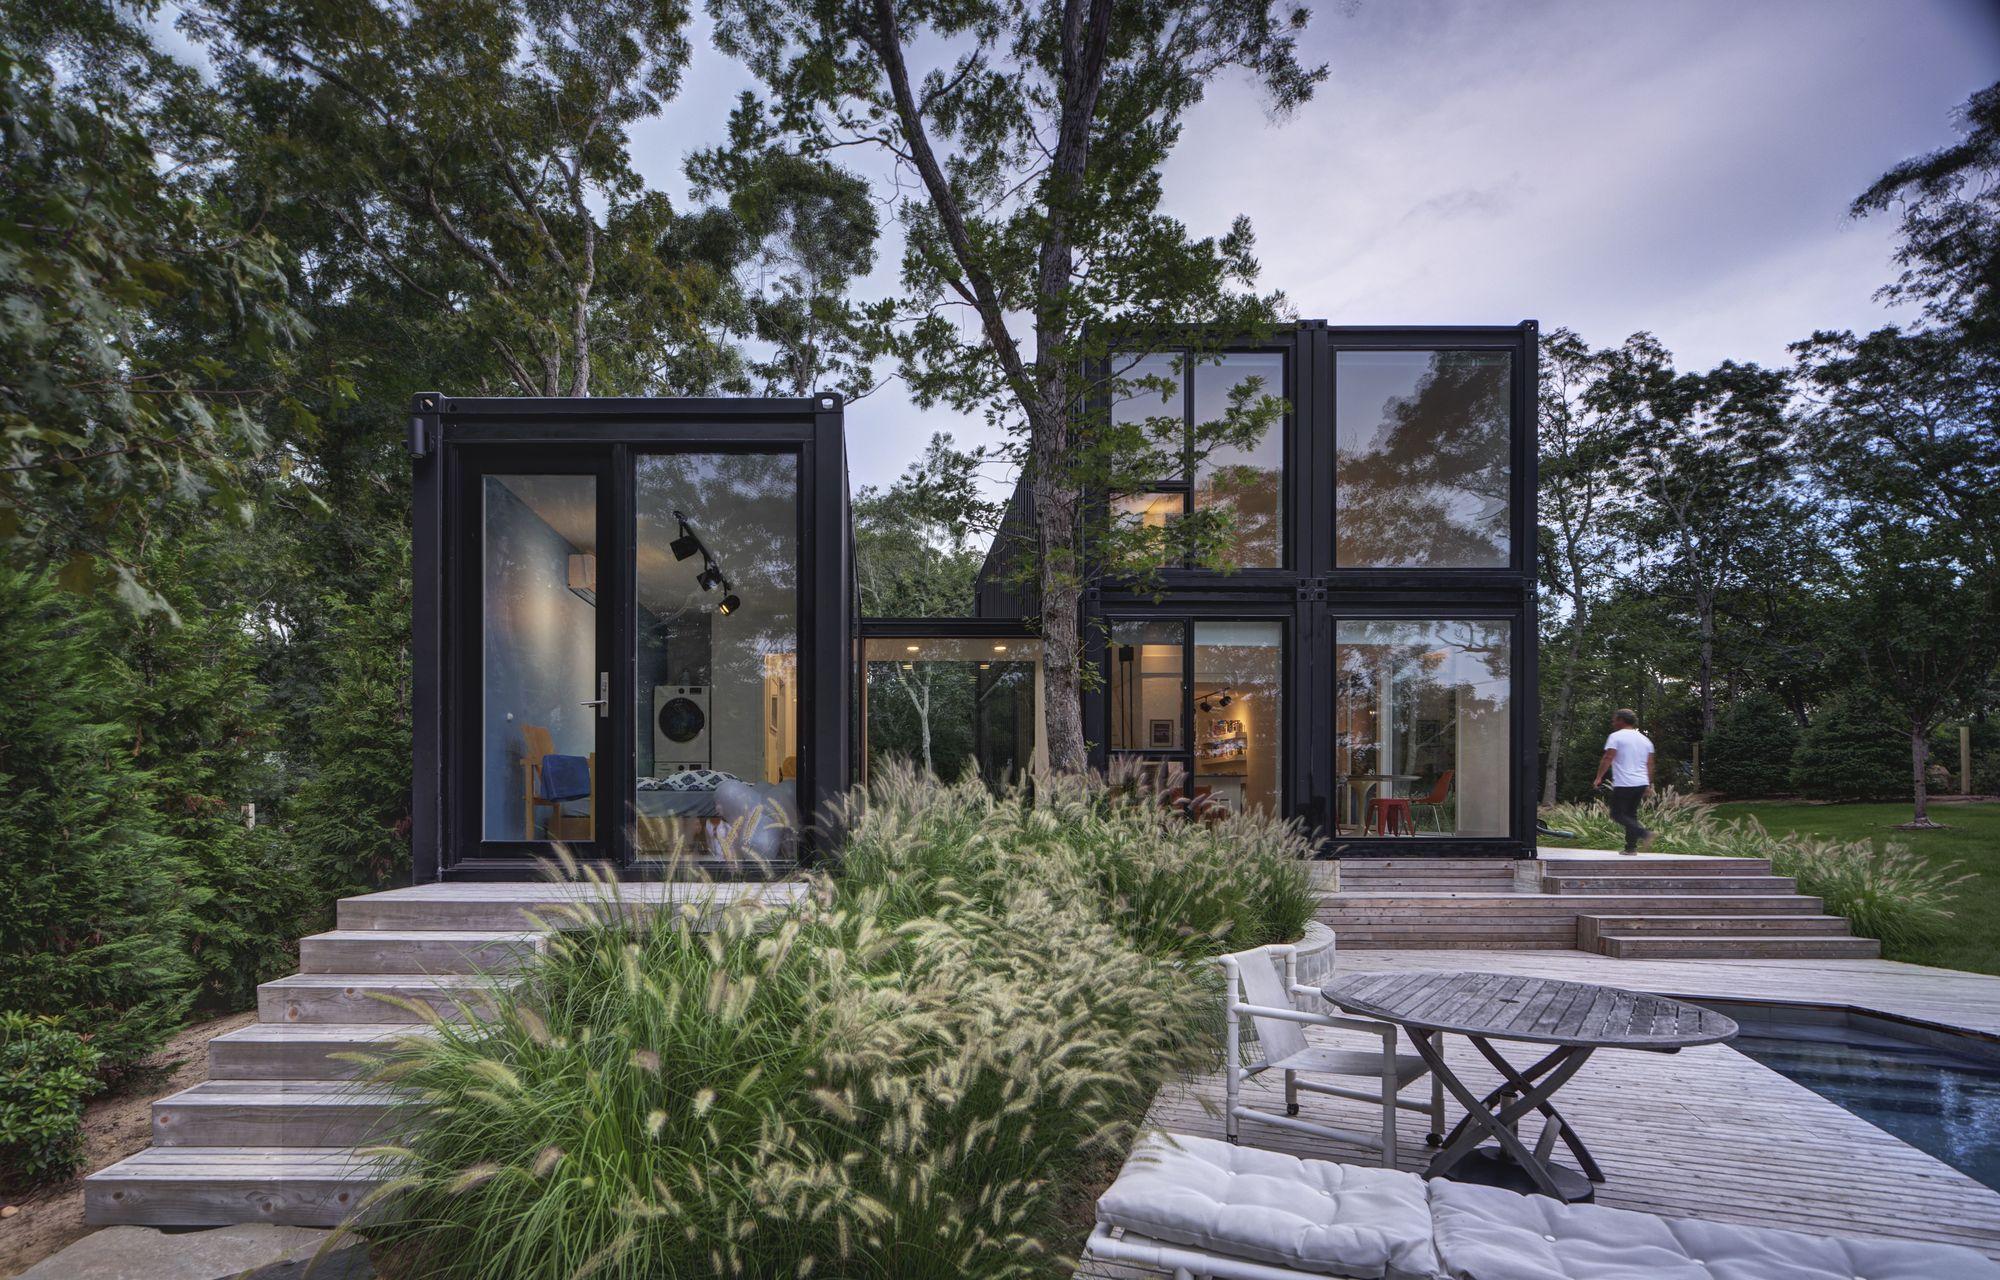 Amagansett Modular House / MB Architecture